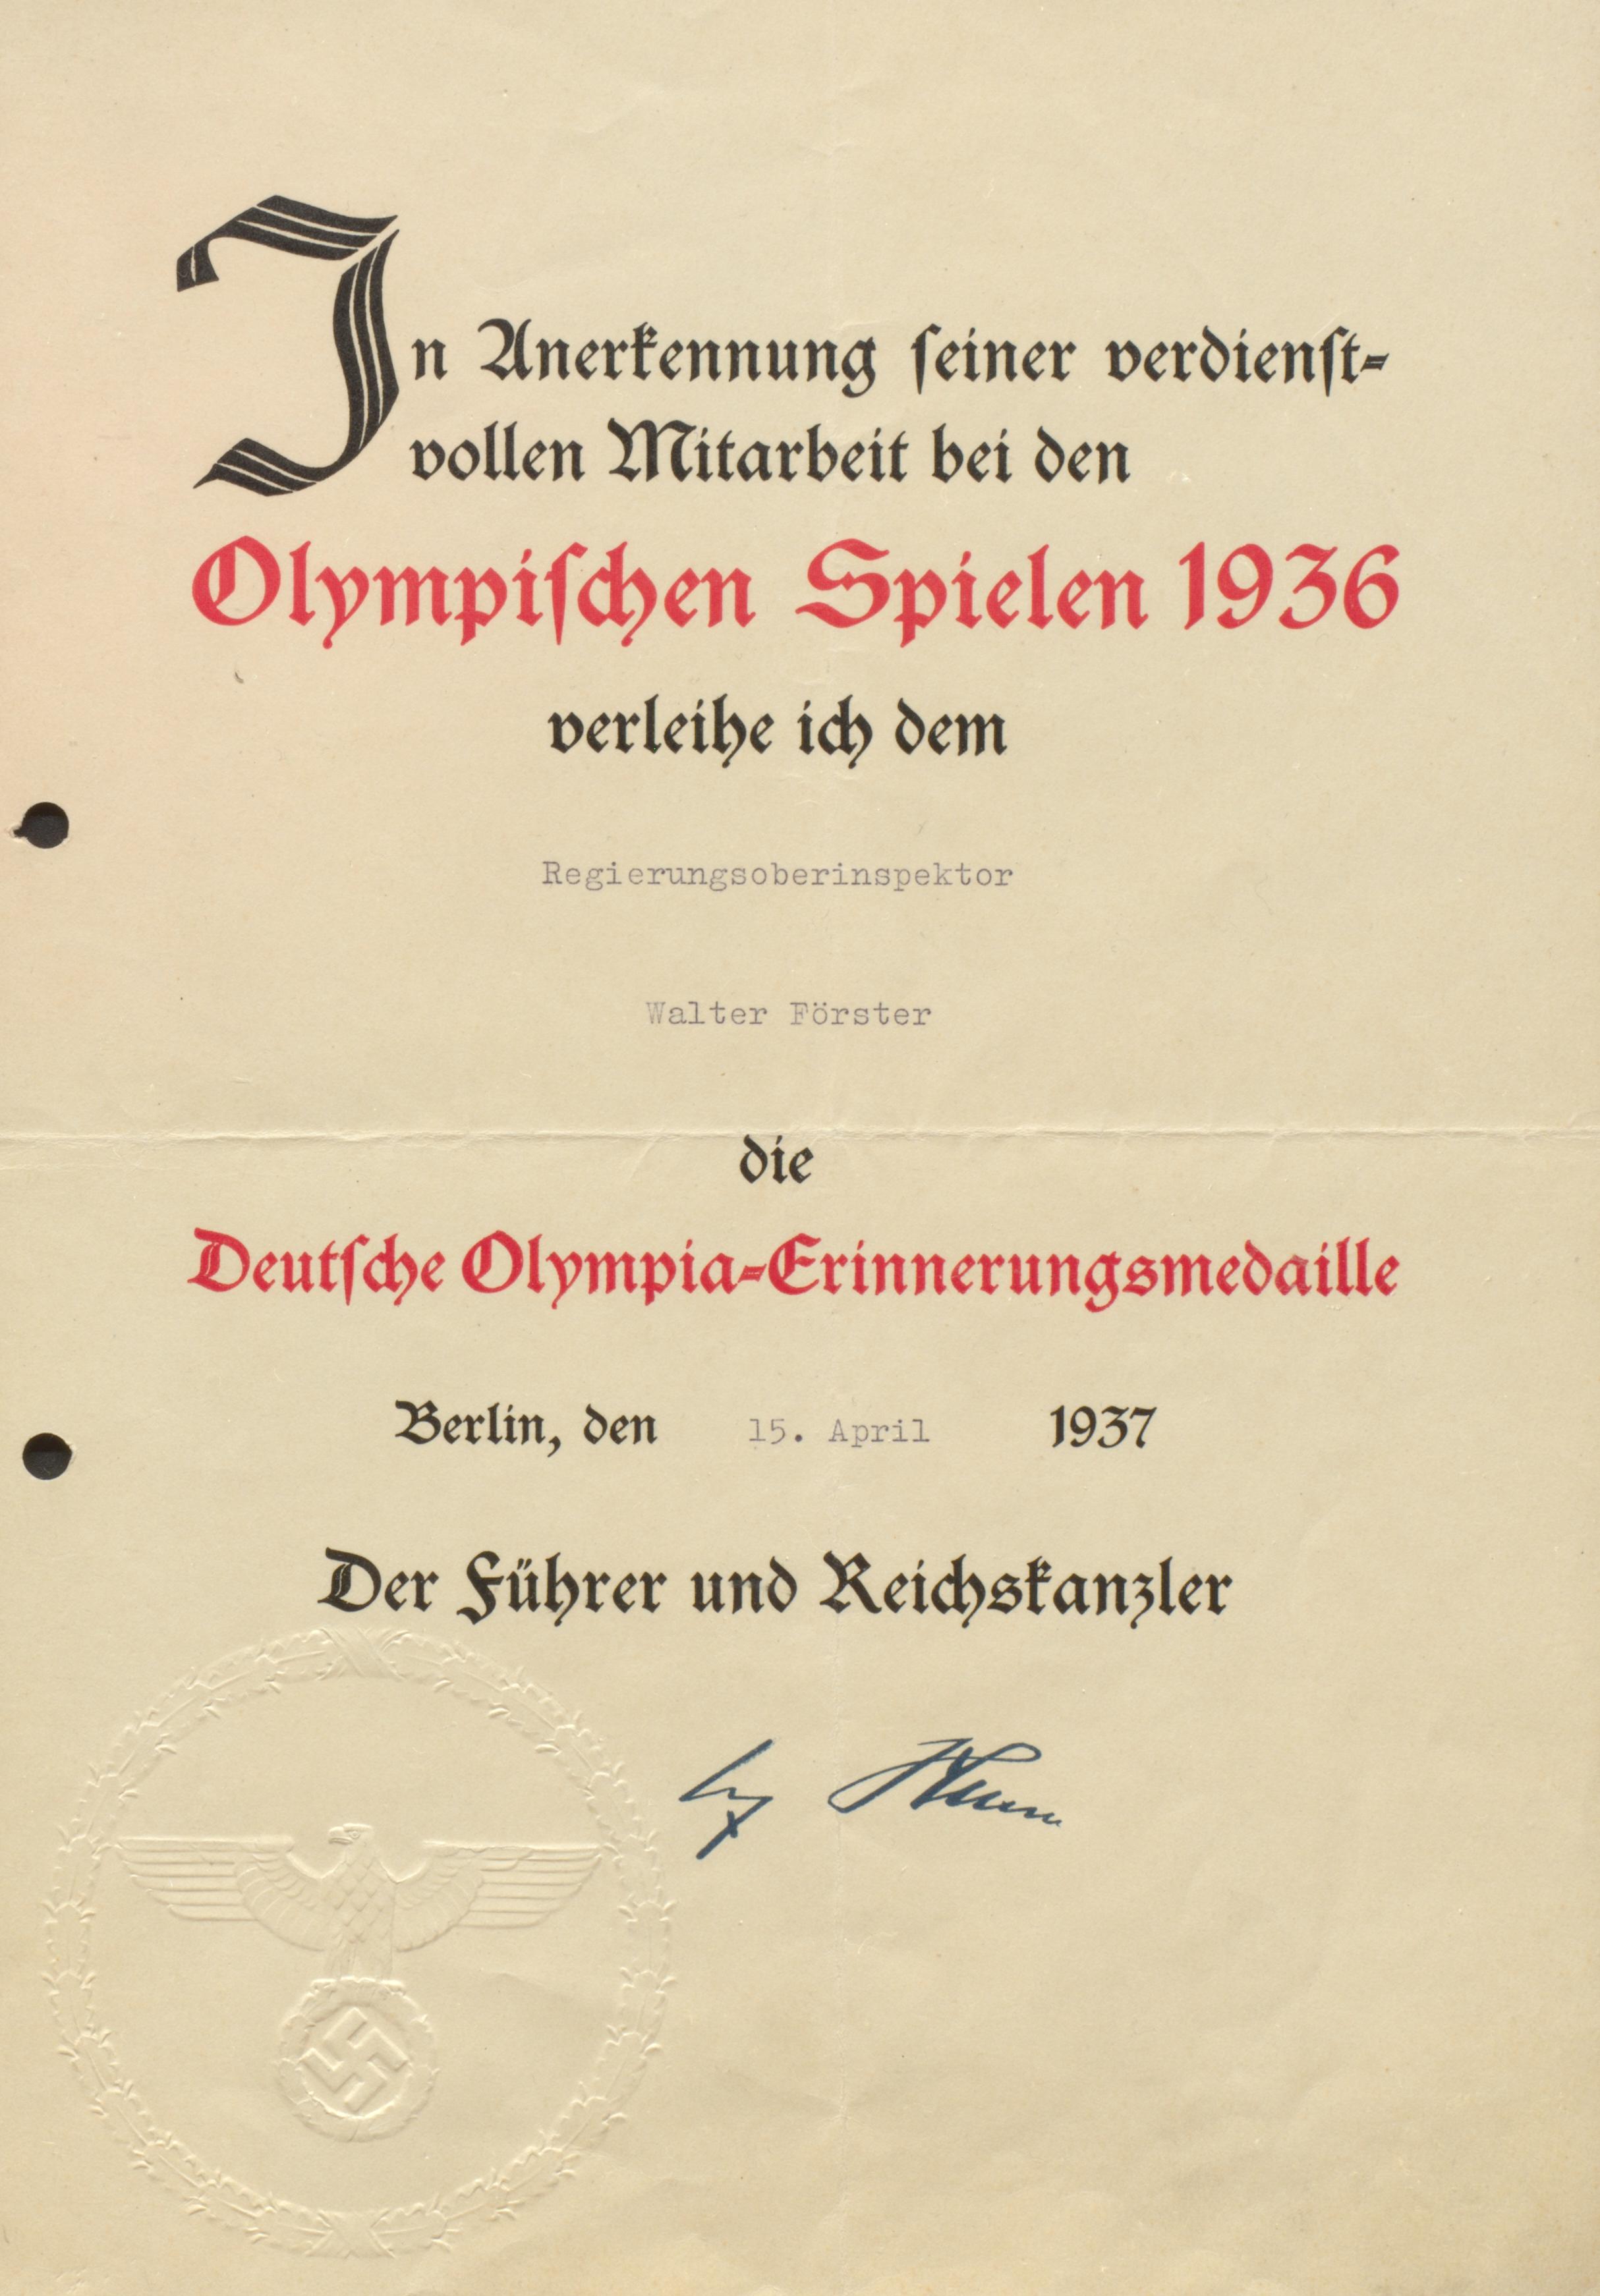 7. Urkunde_Mitarbeit Olympia